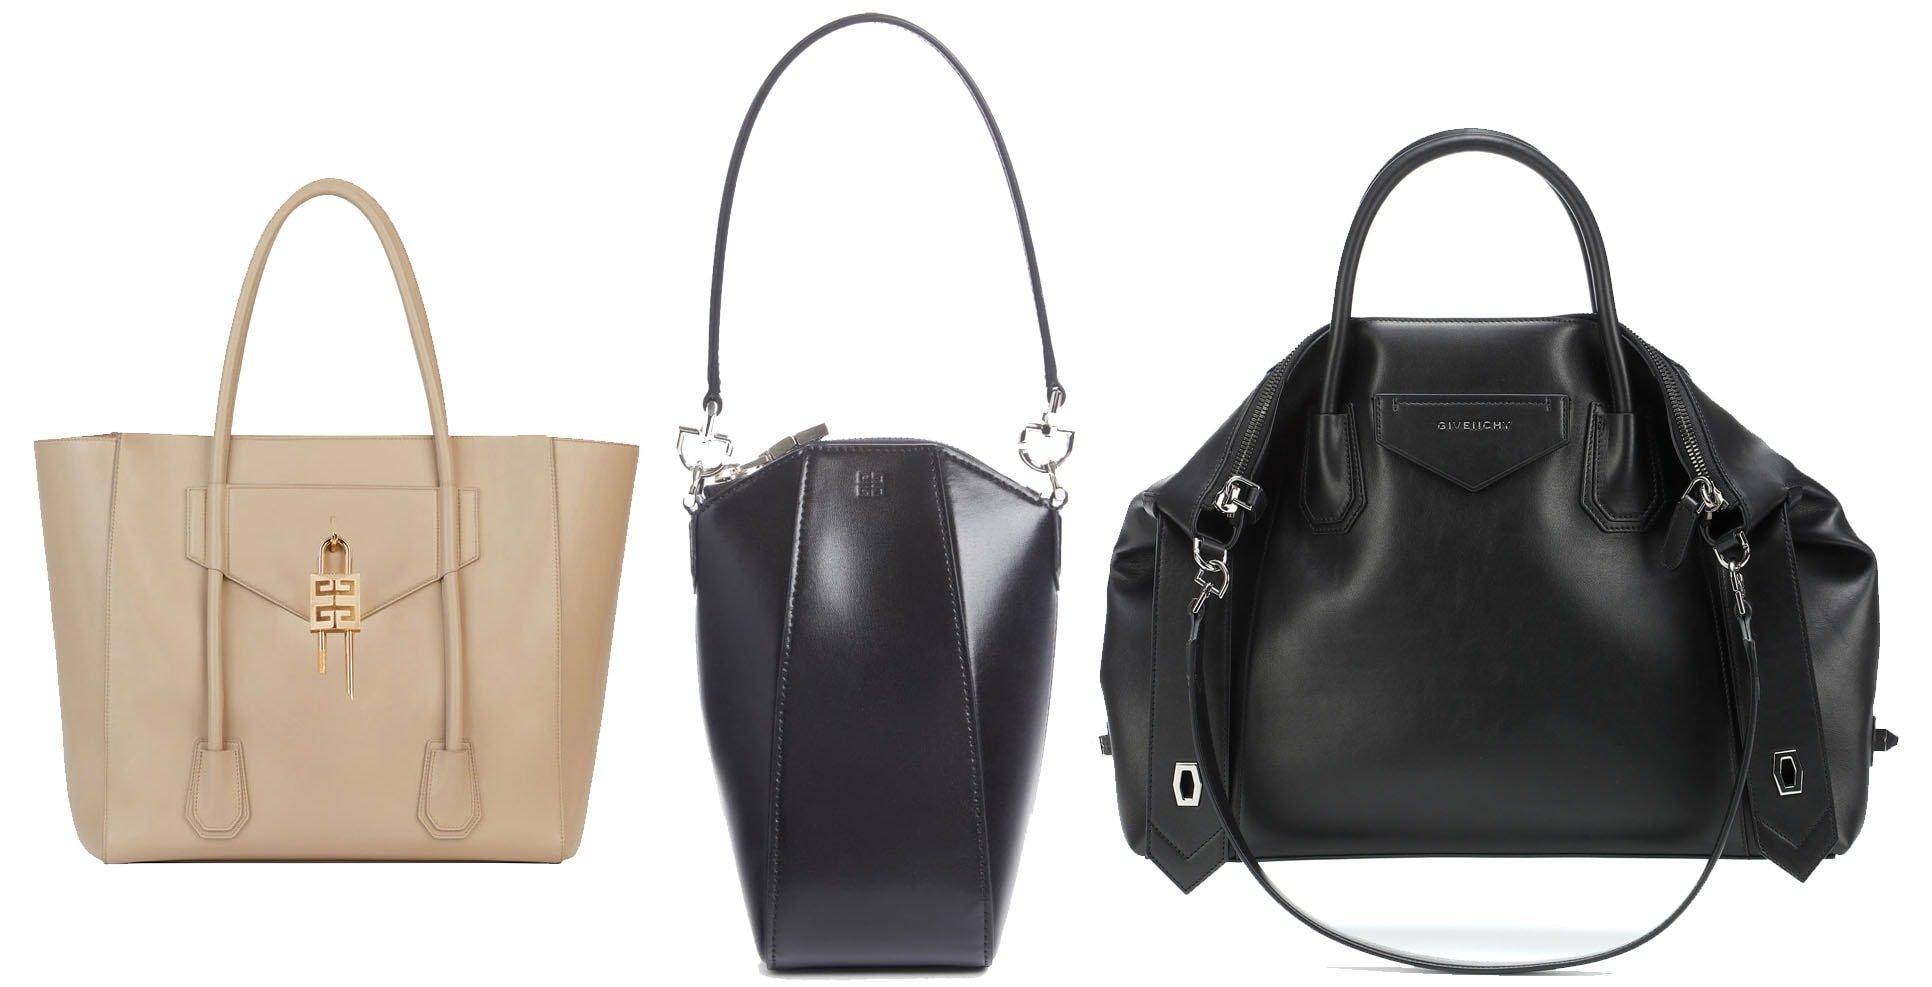 Givenchy Antigona soft shopper bag (left), mini vertical leather bag (middle), soft medium leather tote (right)